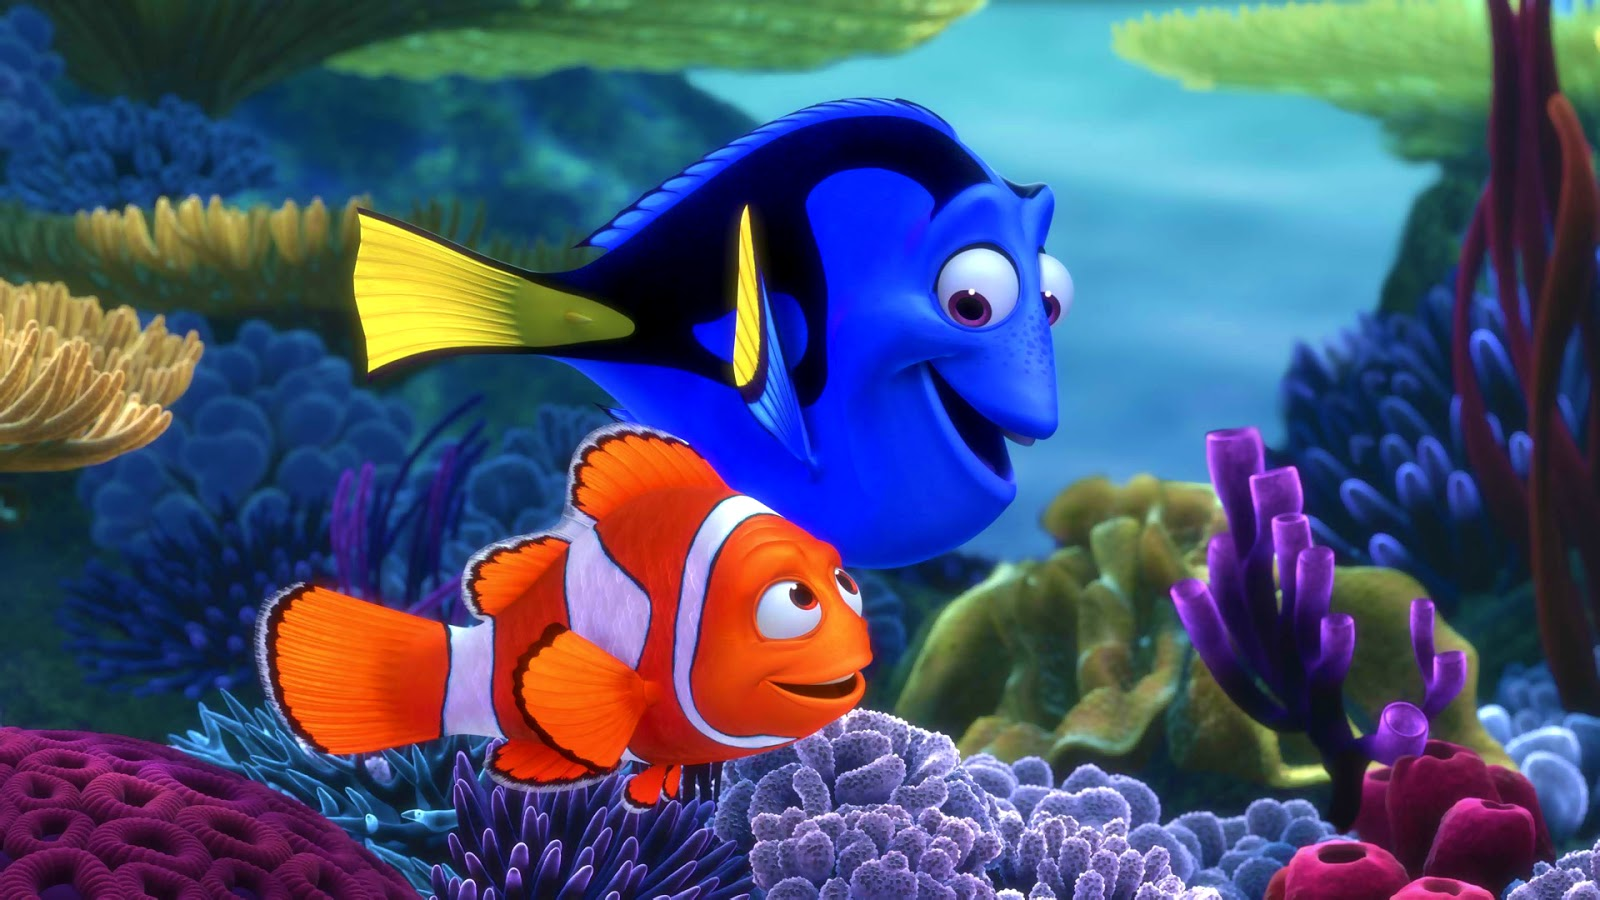 Finding Nemo 3D Wallpaper Wallpaper Mansion 1600x900